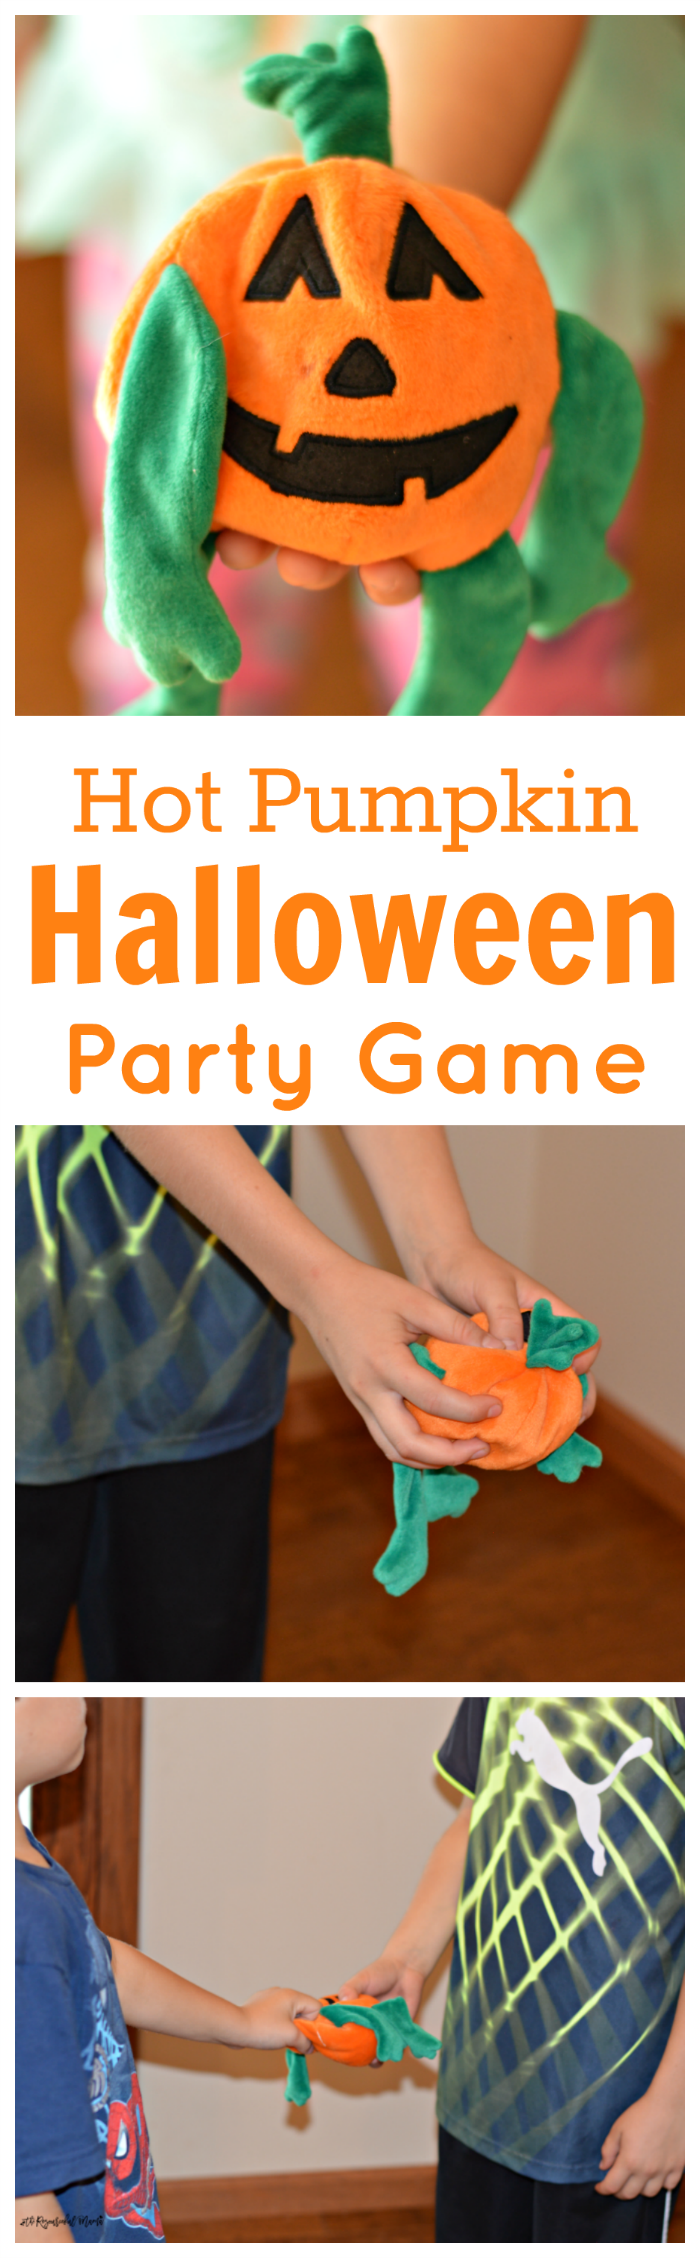 Hot Pumpkin Halloween Party Game | Halloween party games